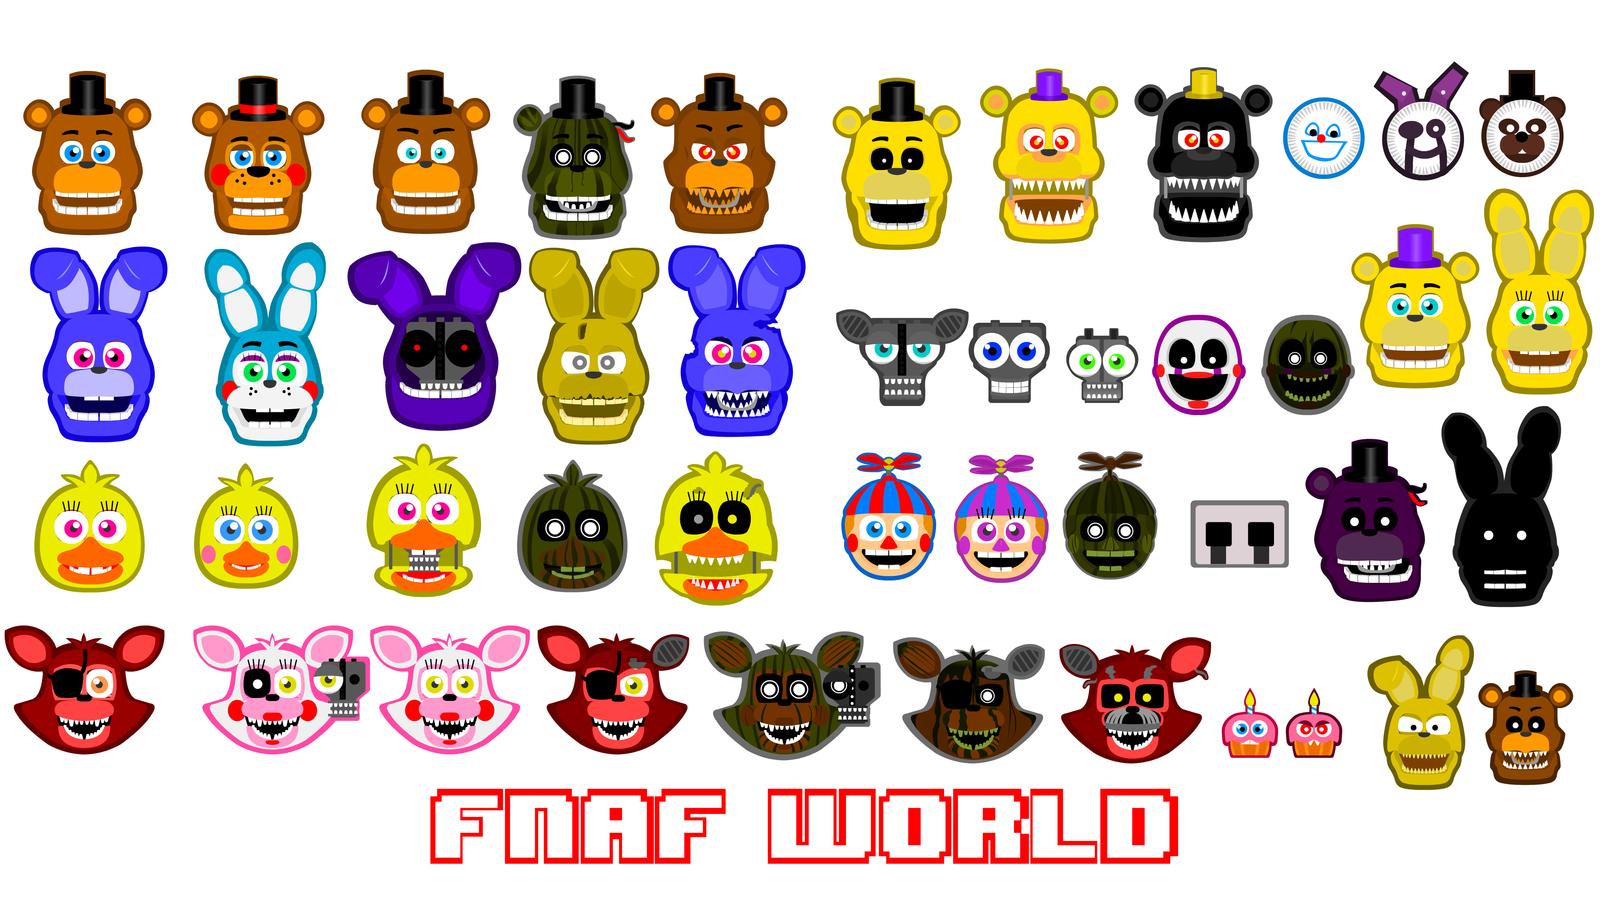 Group of Fnaf World All